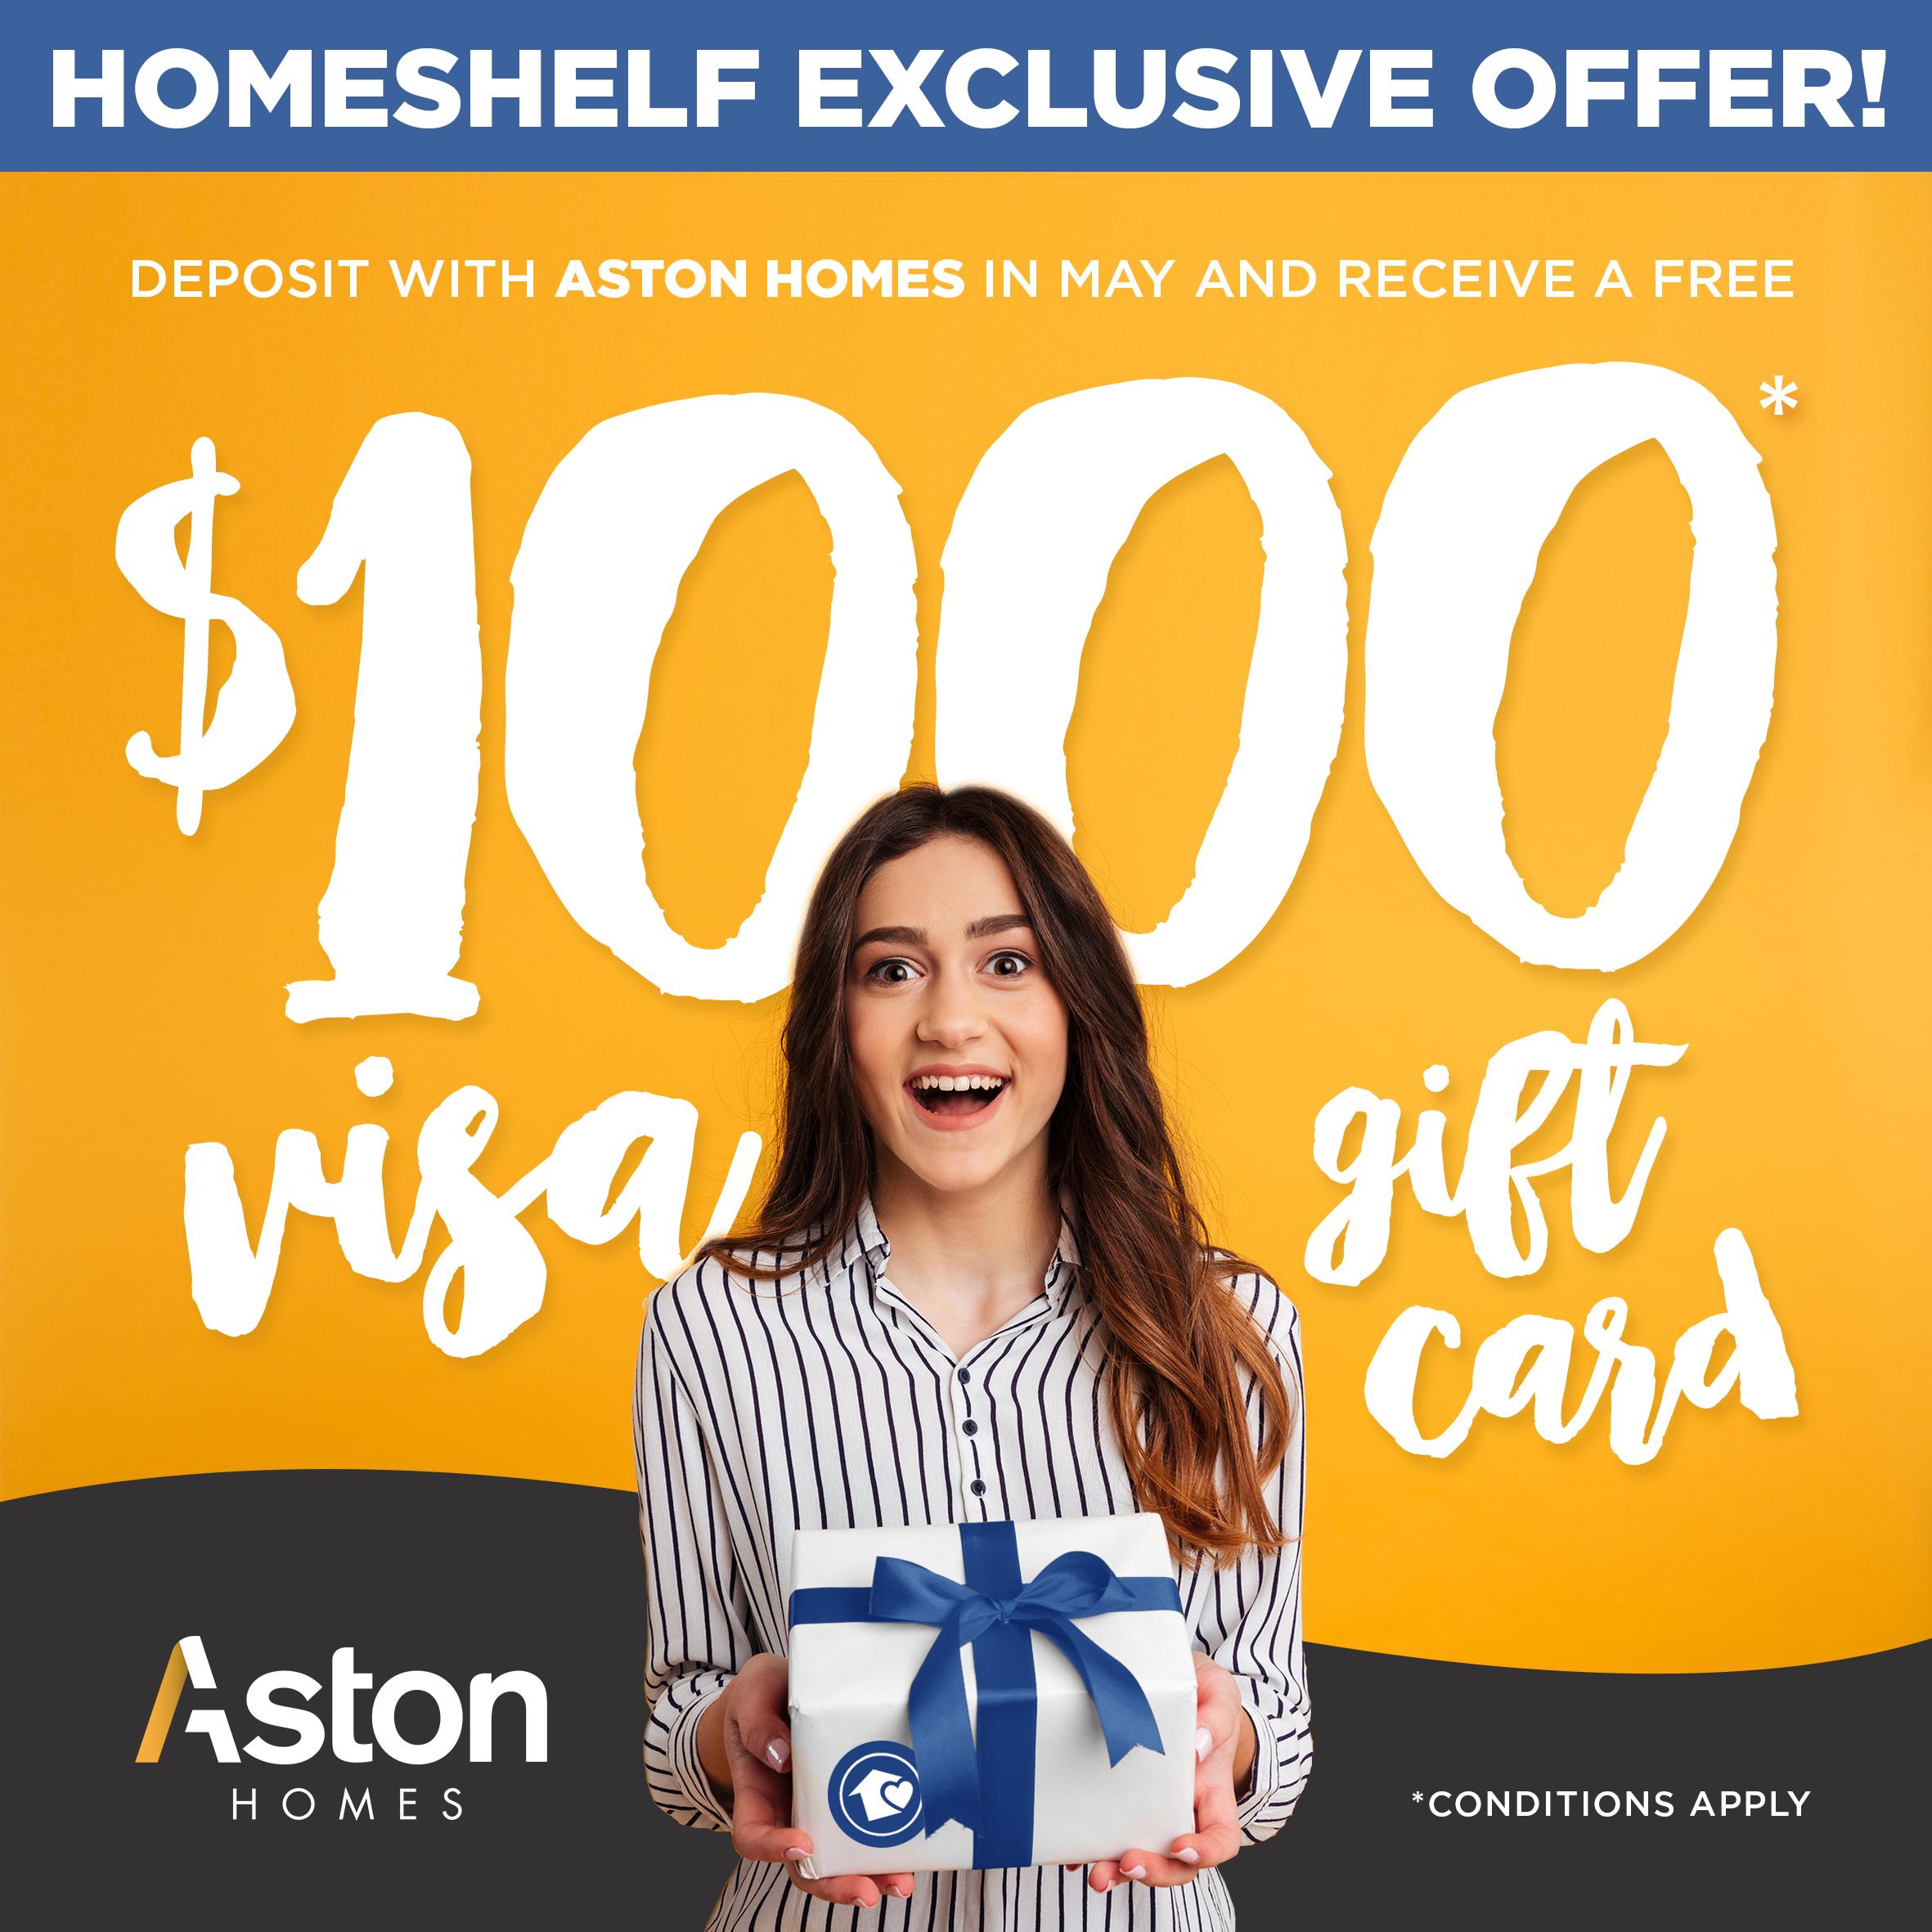 Homeshelf Exclusive Offer!